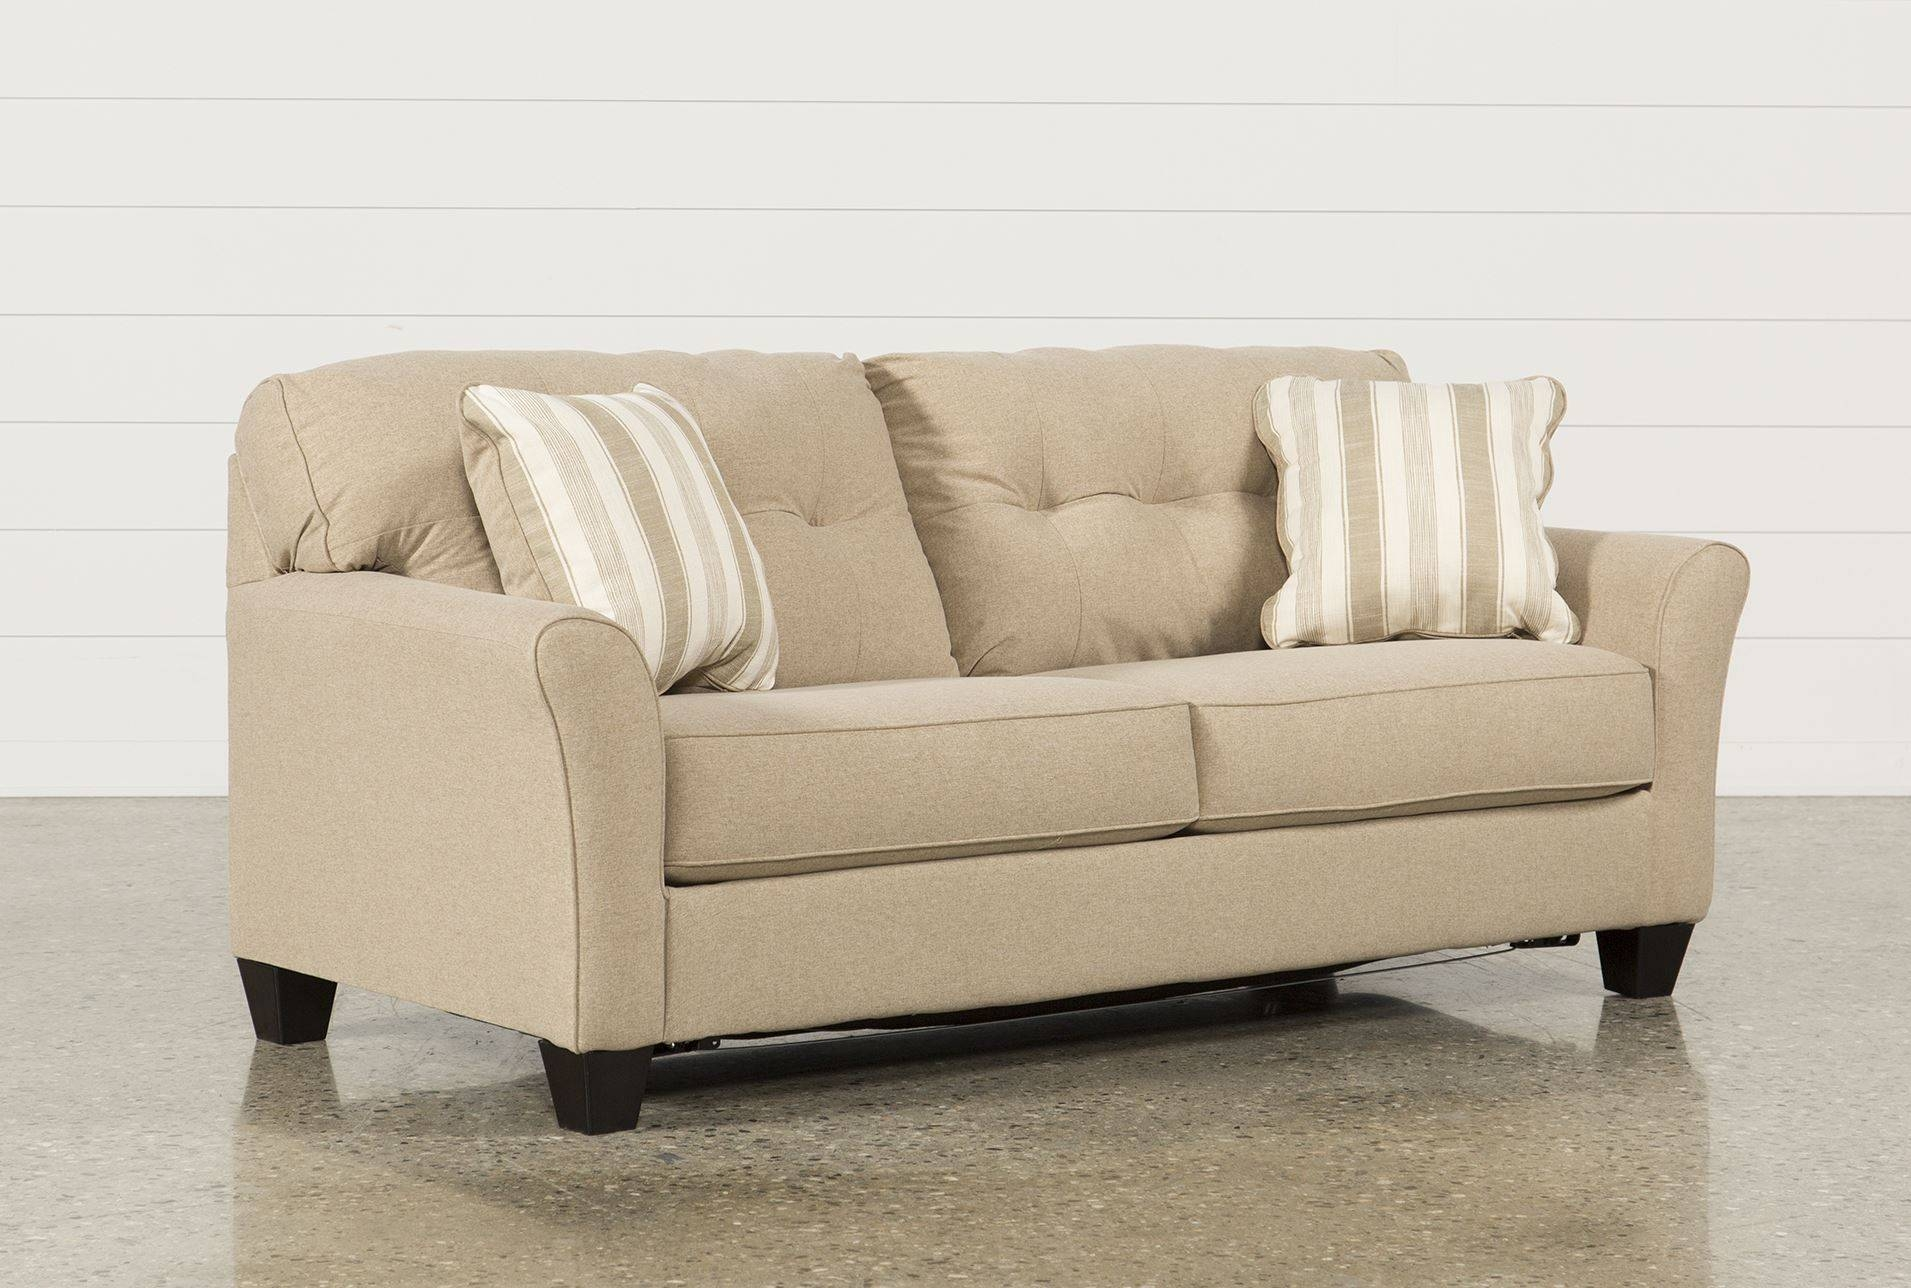 King Size Sleeper Sofa inside King Size Sleeper Sofa Sectional (Image 13 of 30)